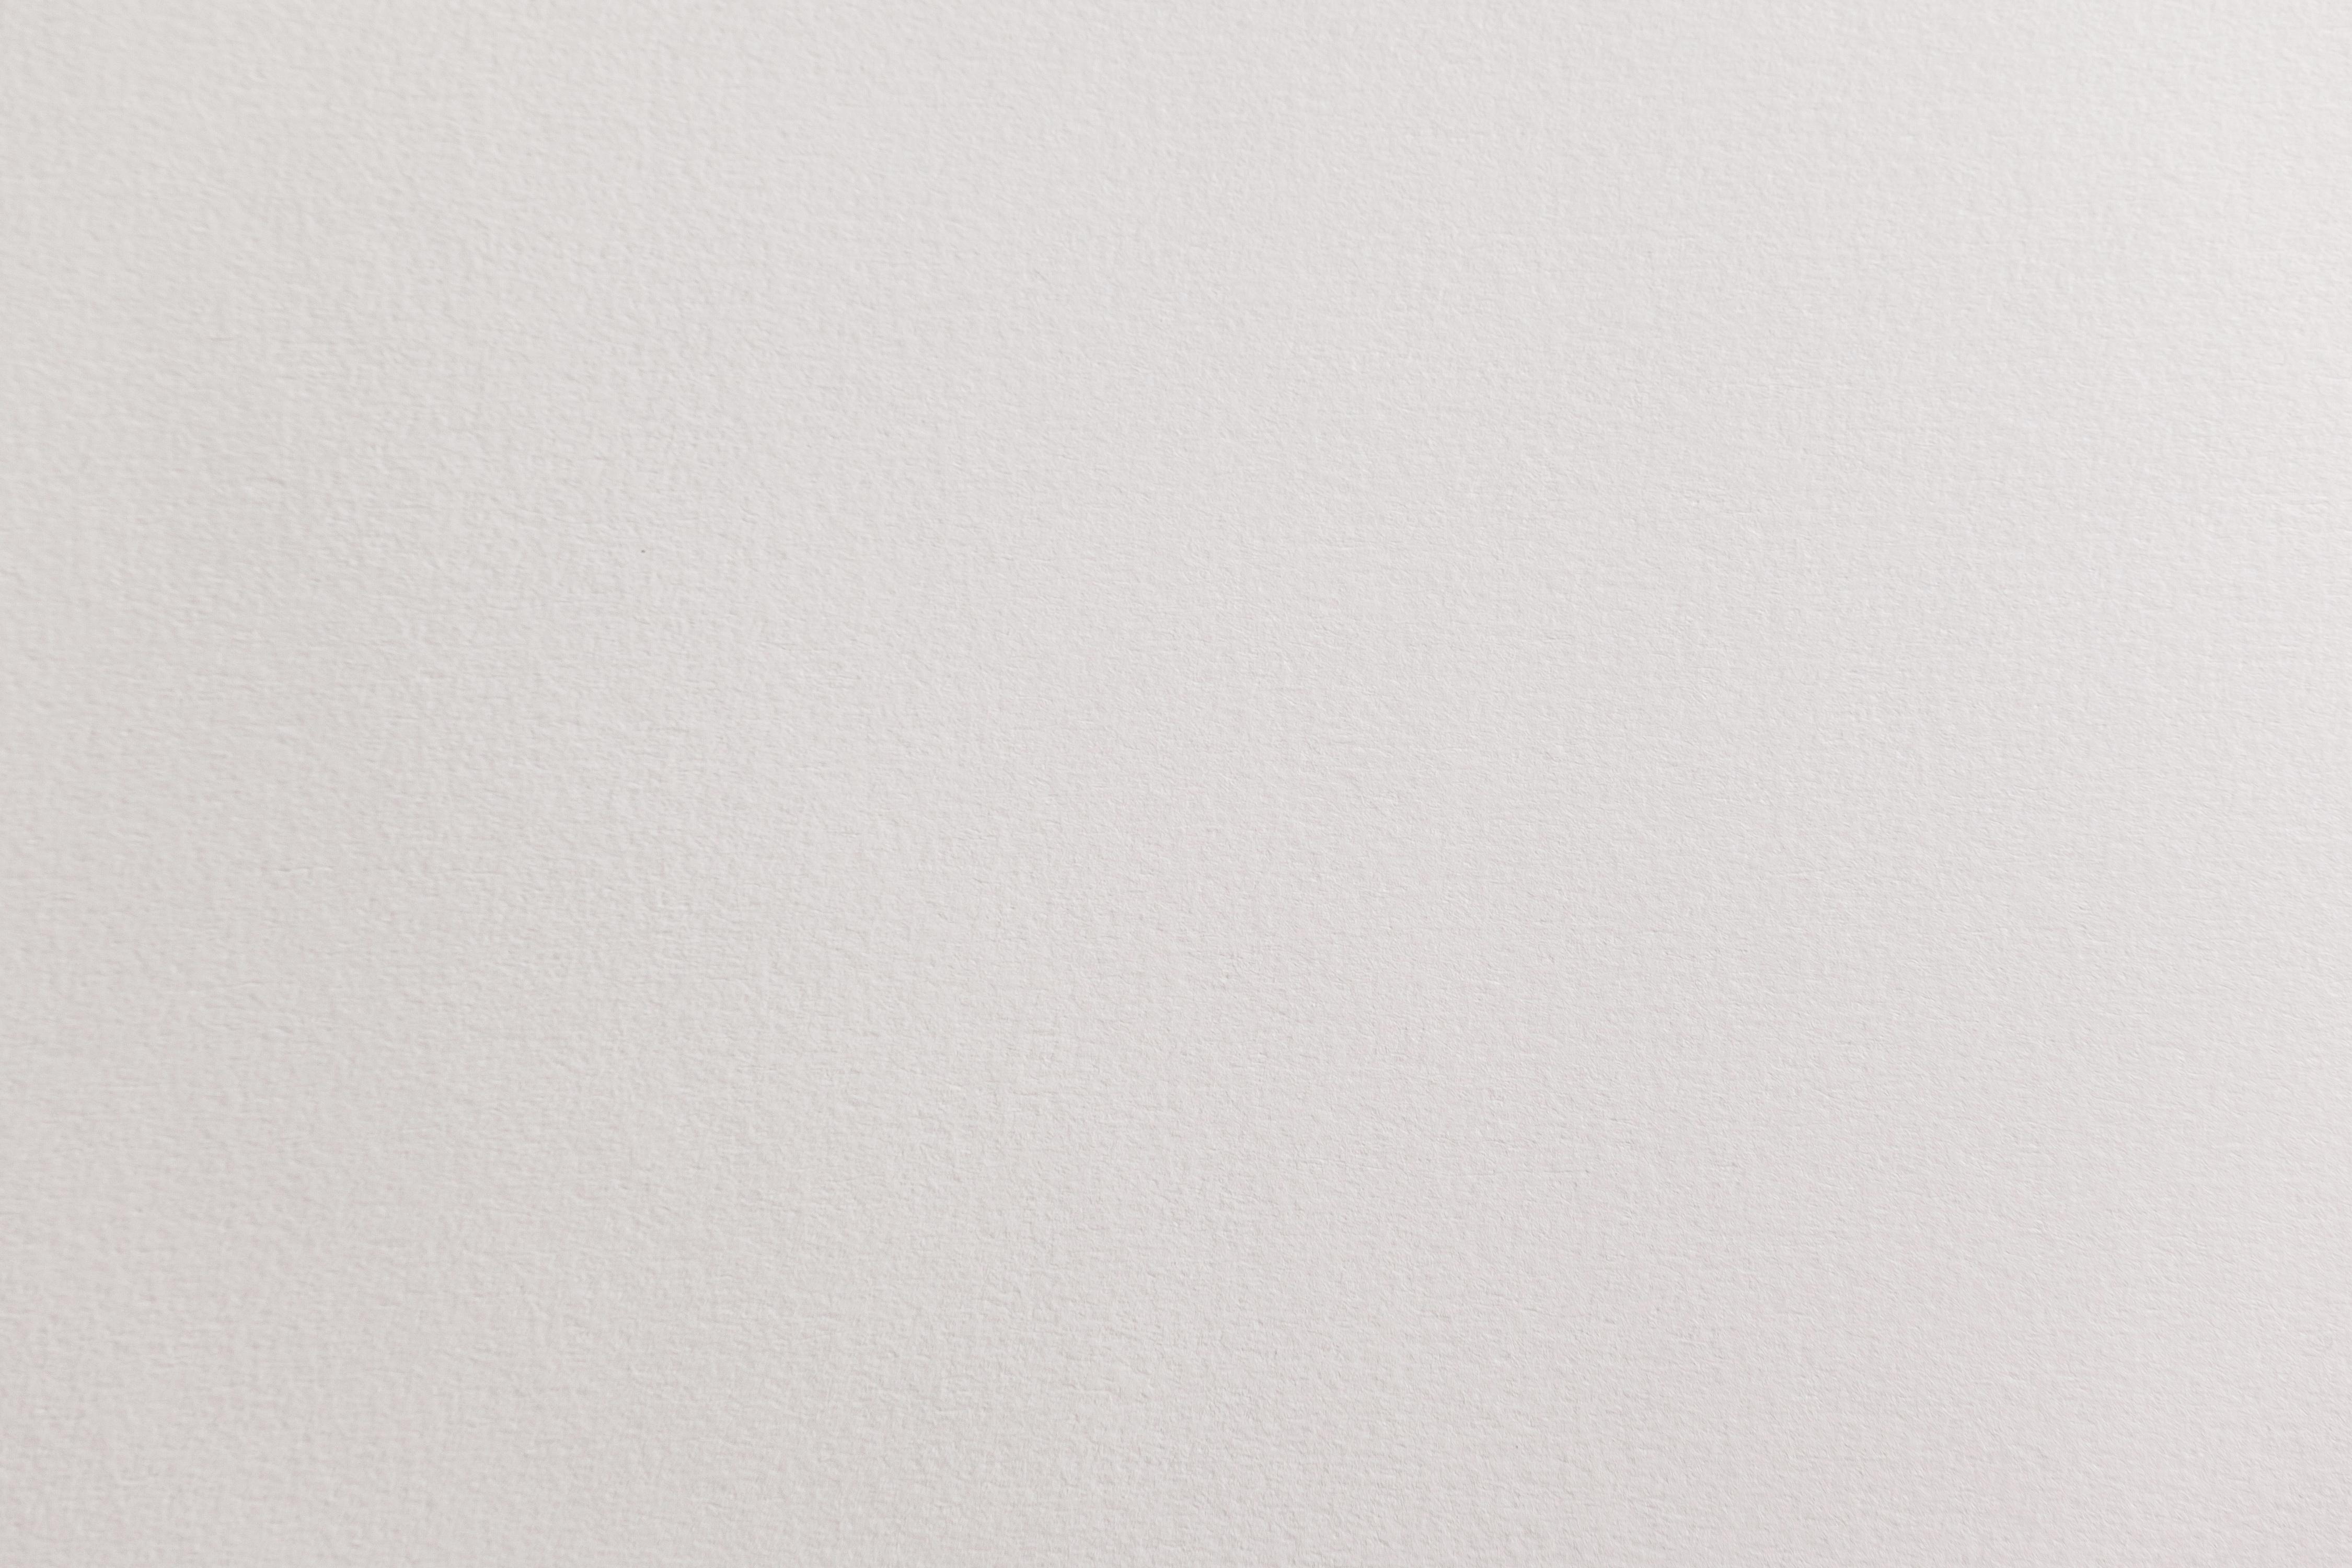 White paper texture photo